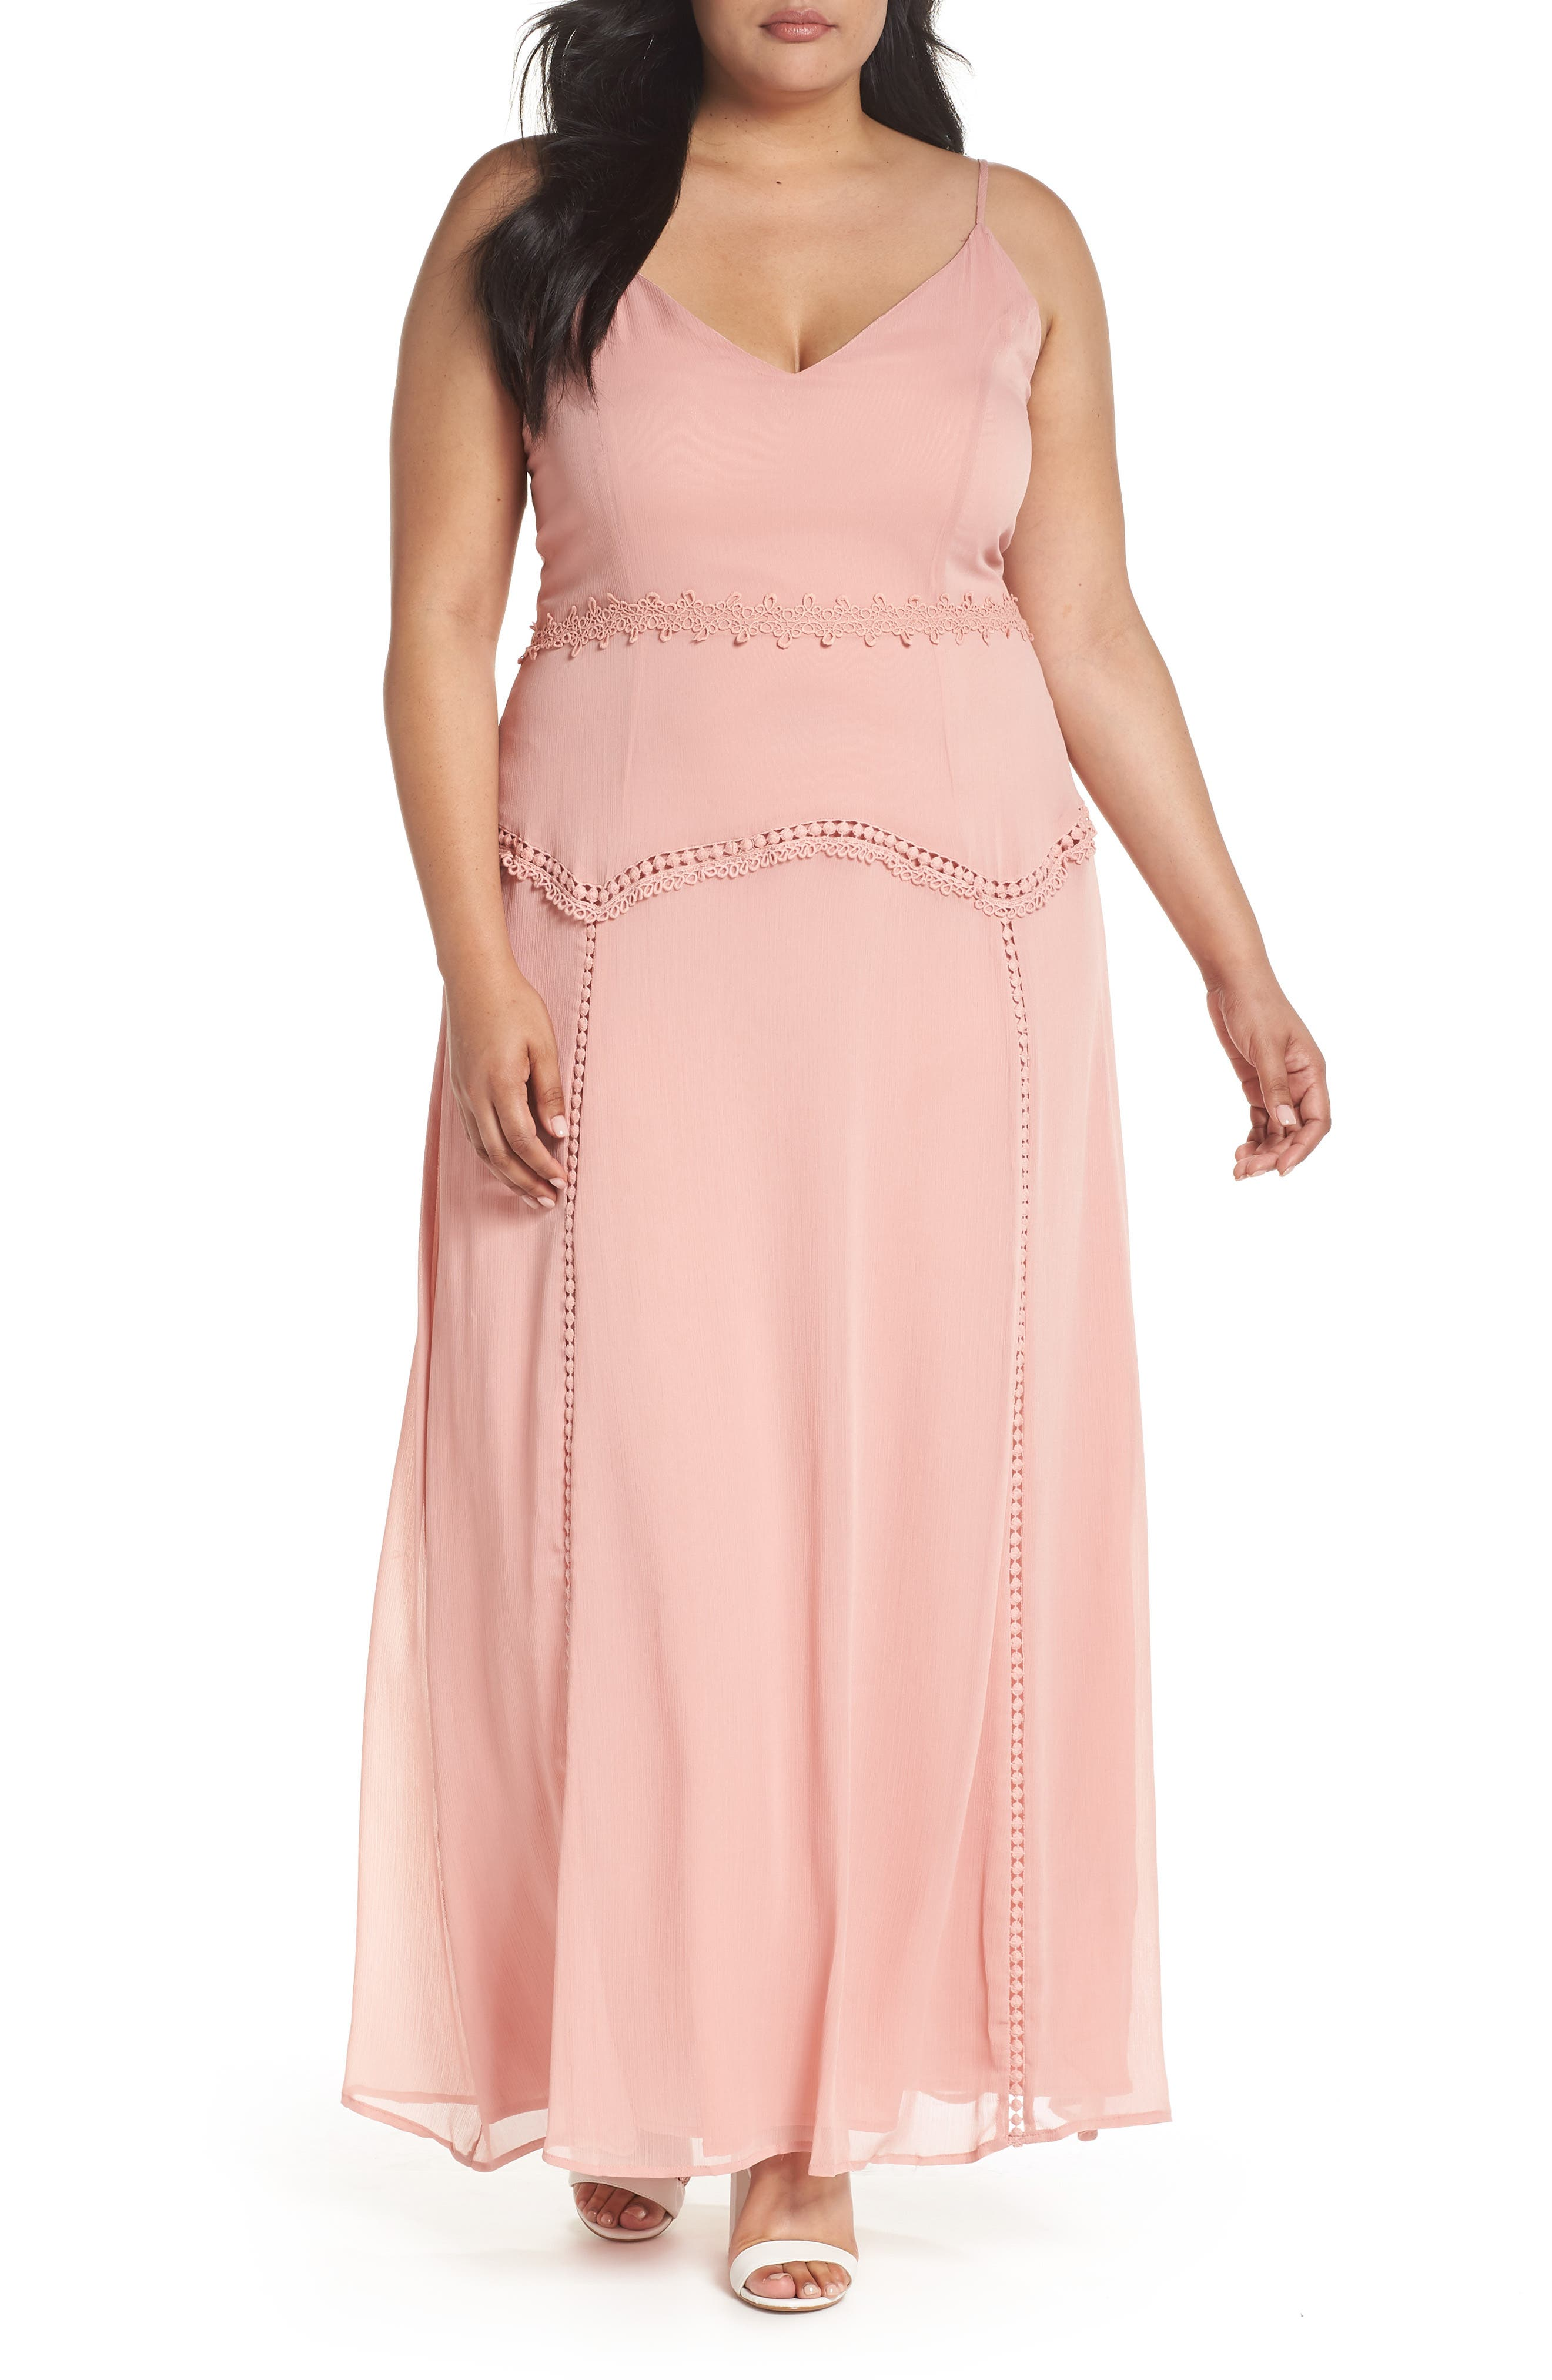 Alternate Image 1 Selected - LOST INK Picot Trim Maxi Dress (Encore)